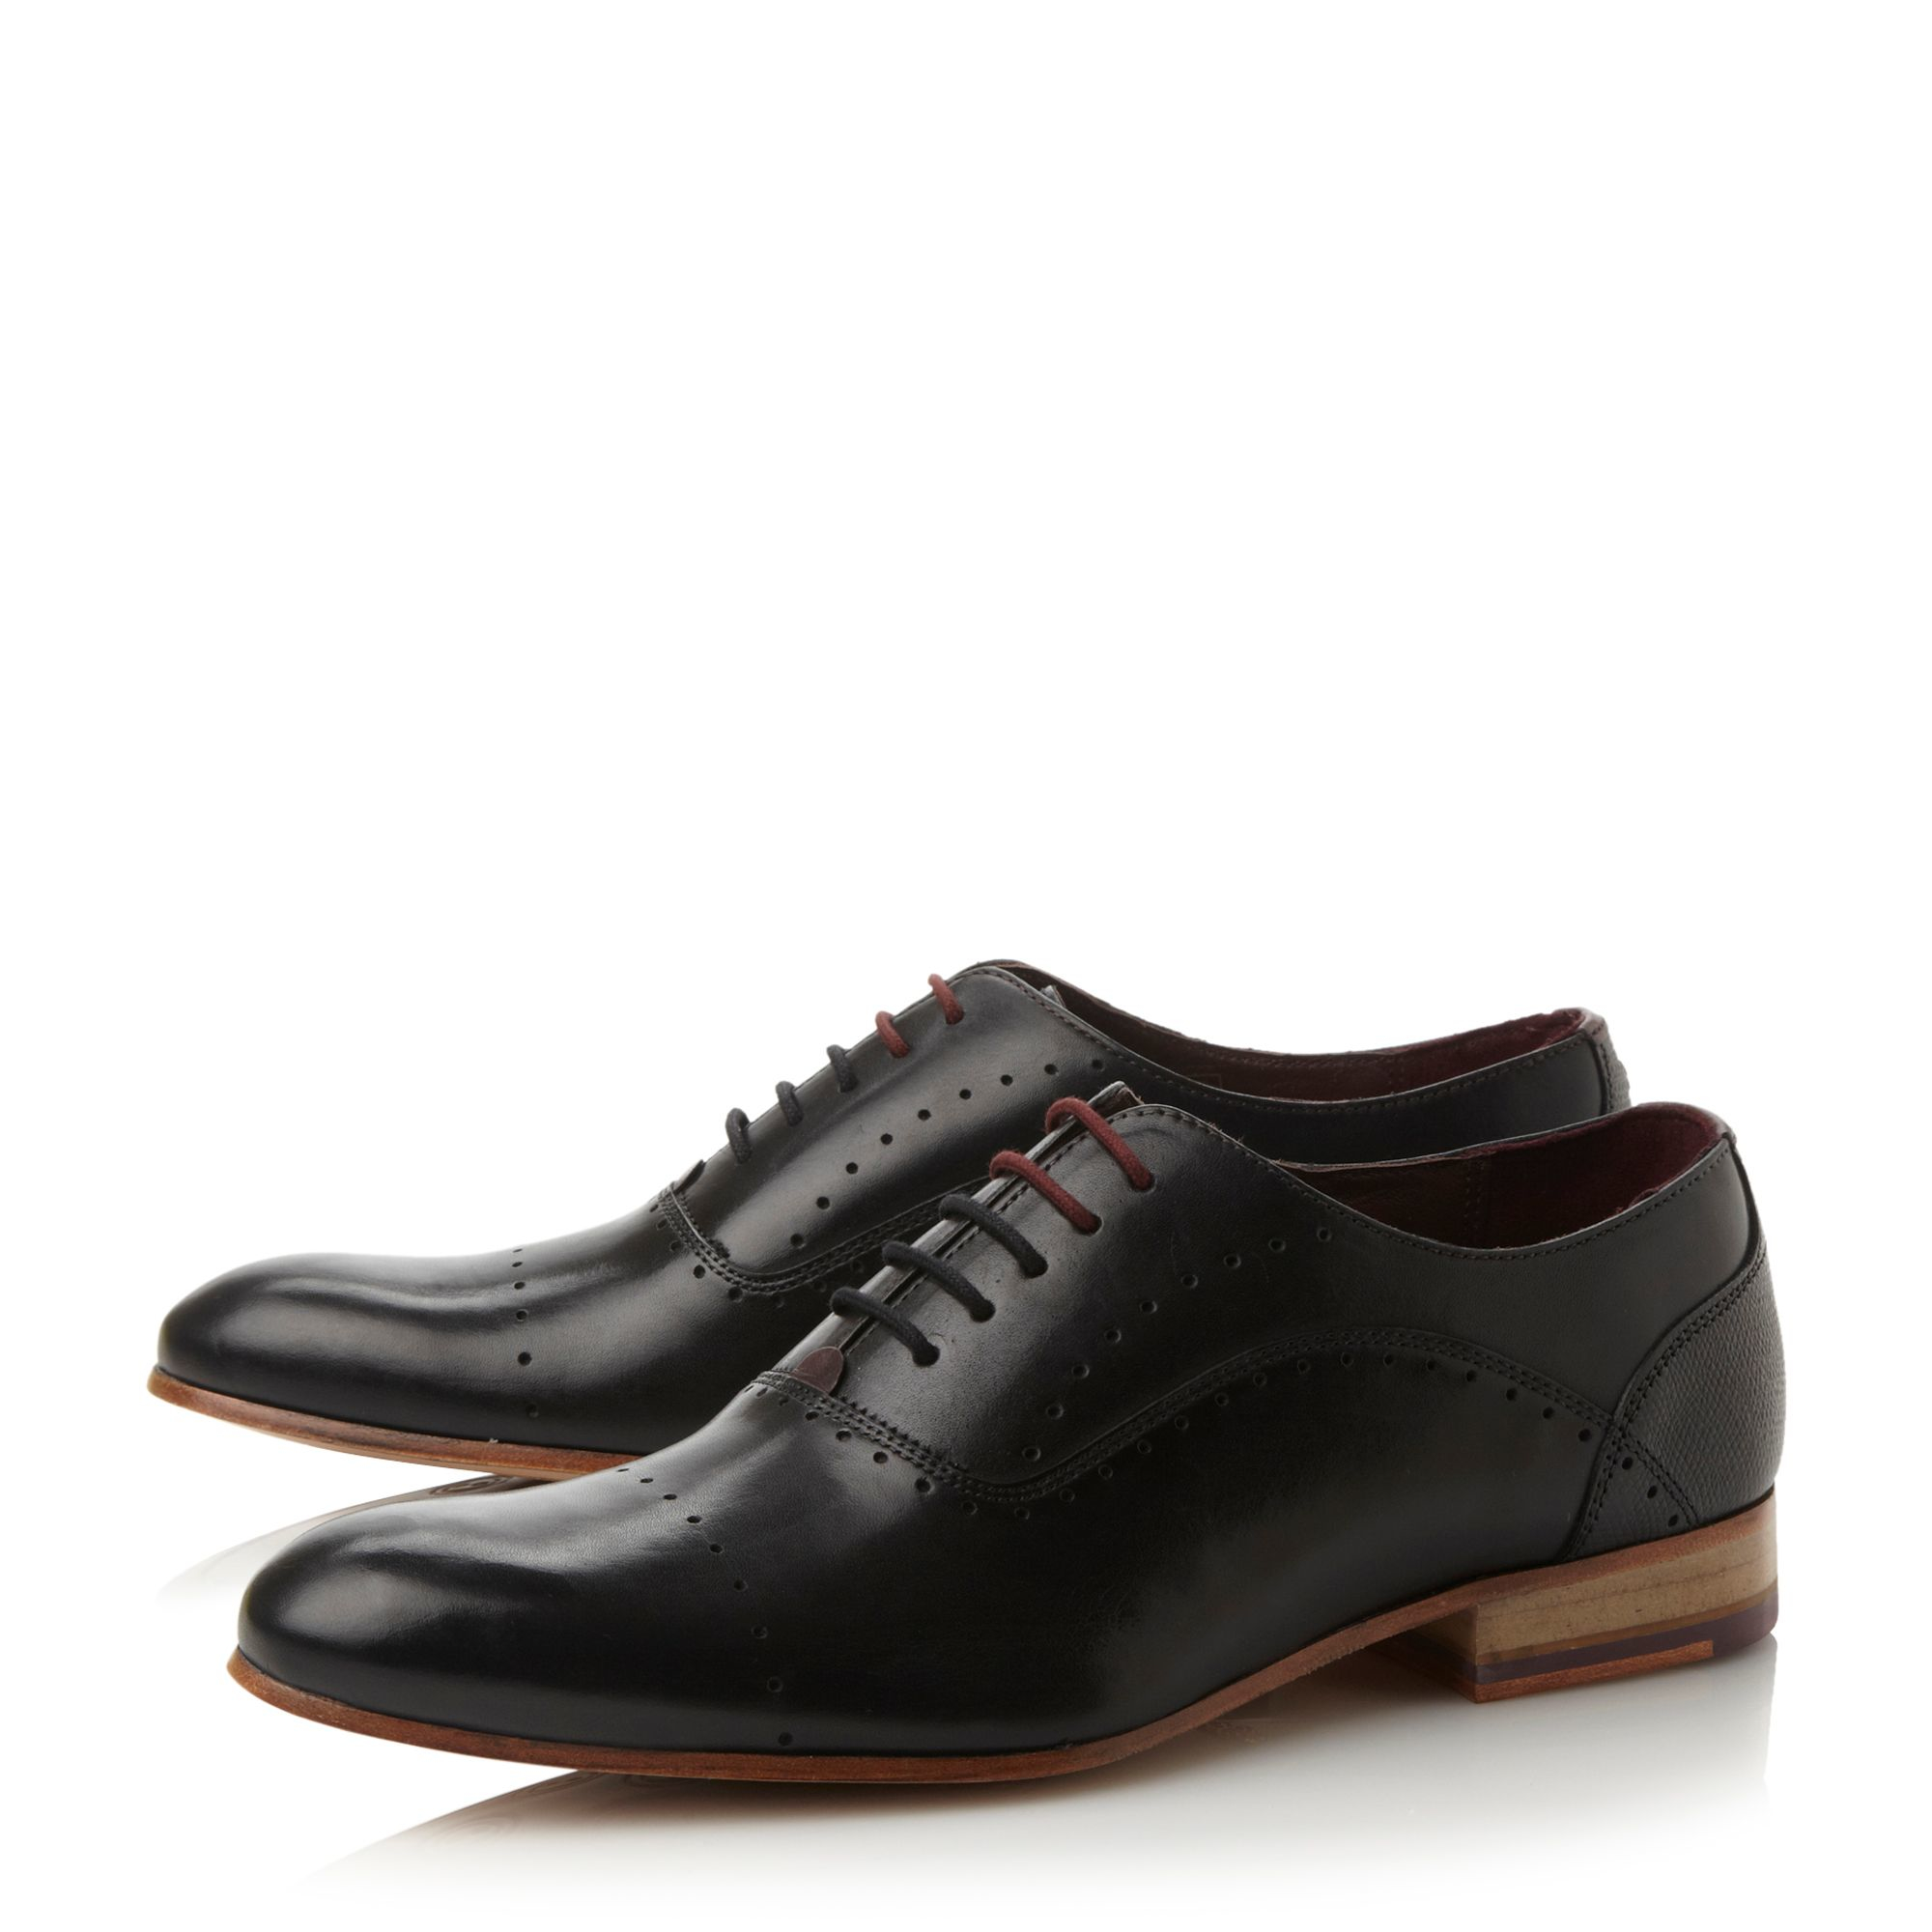 Ted Baker Men S Umbber Leather Oxford Shoes Tan